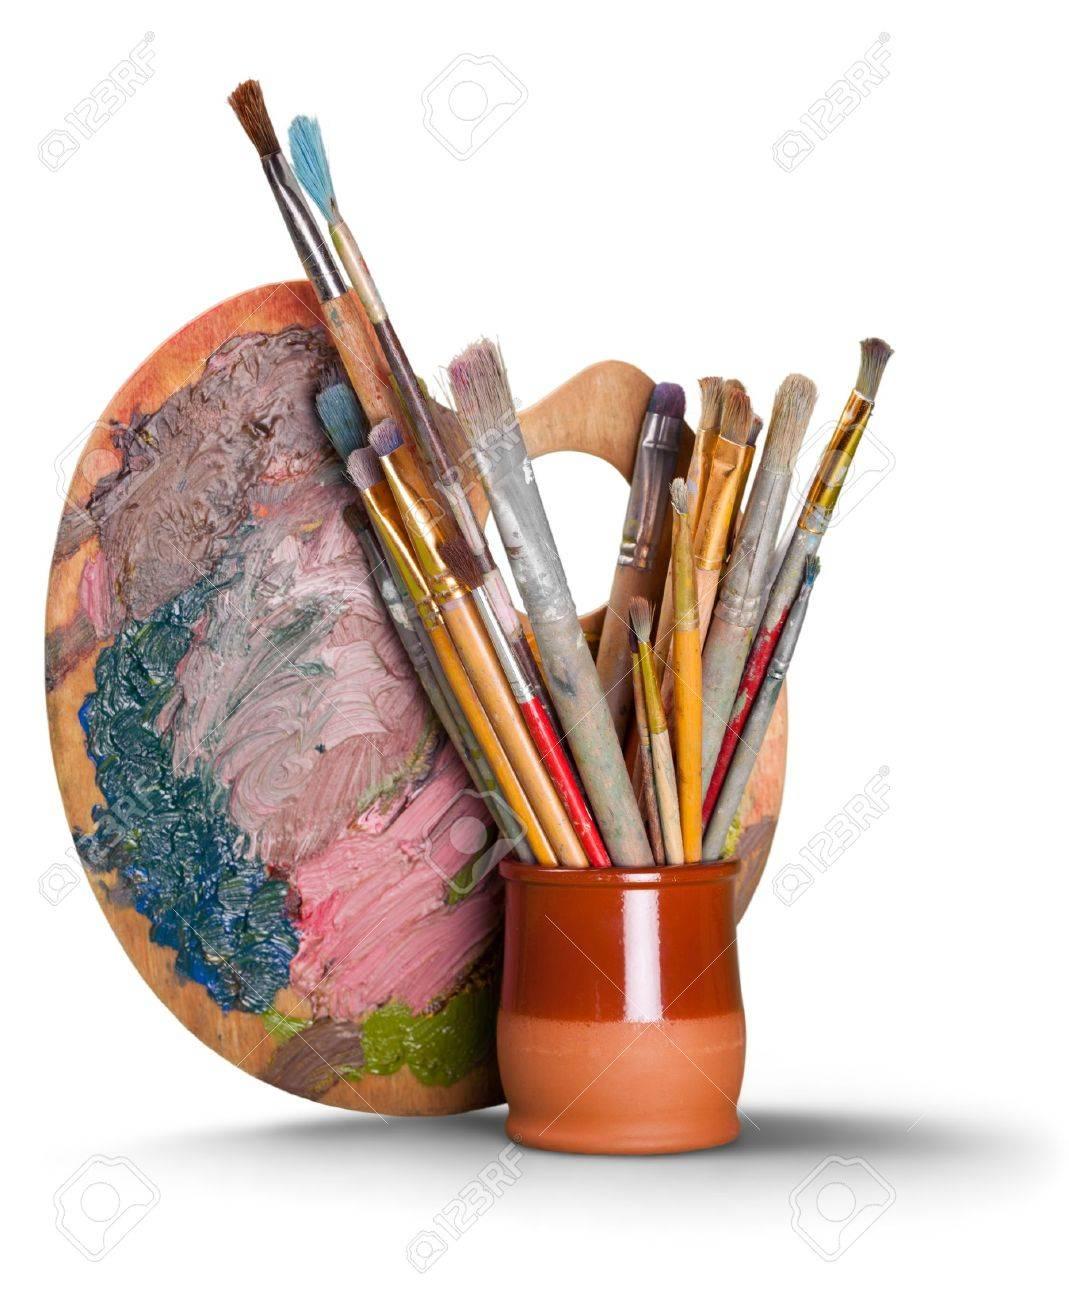 Art and Craft Equipment. - 48344305